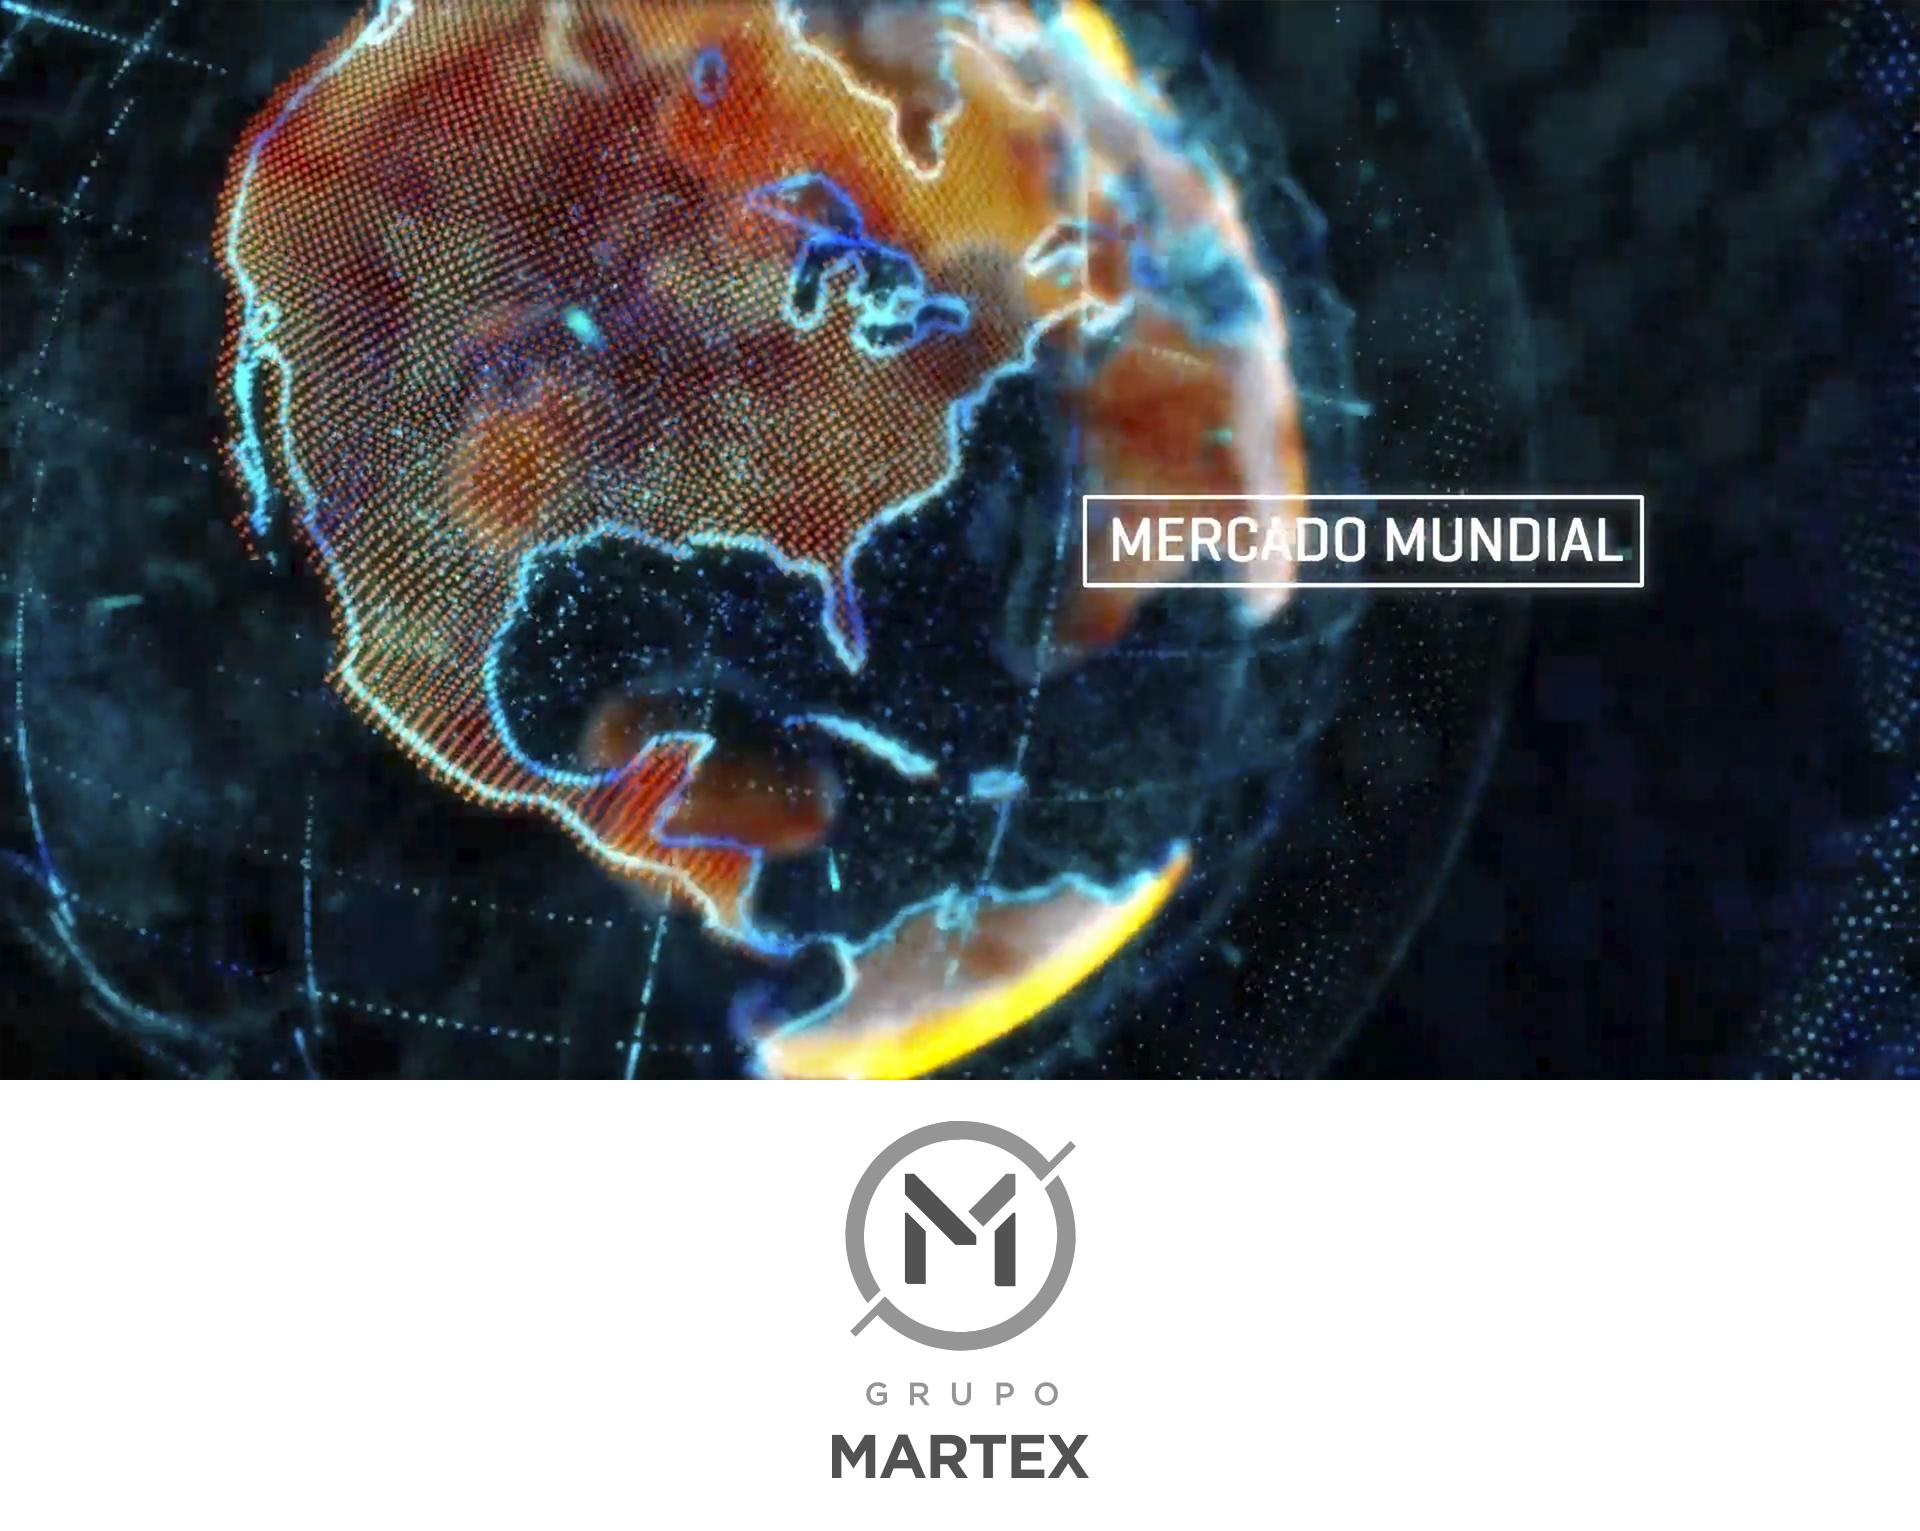 GrupoMartex.jpg